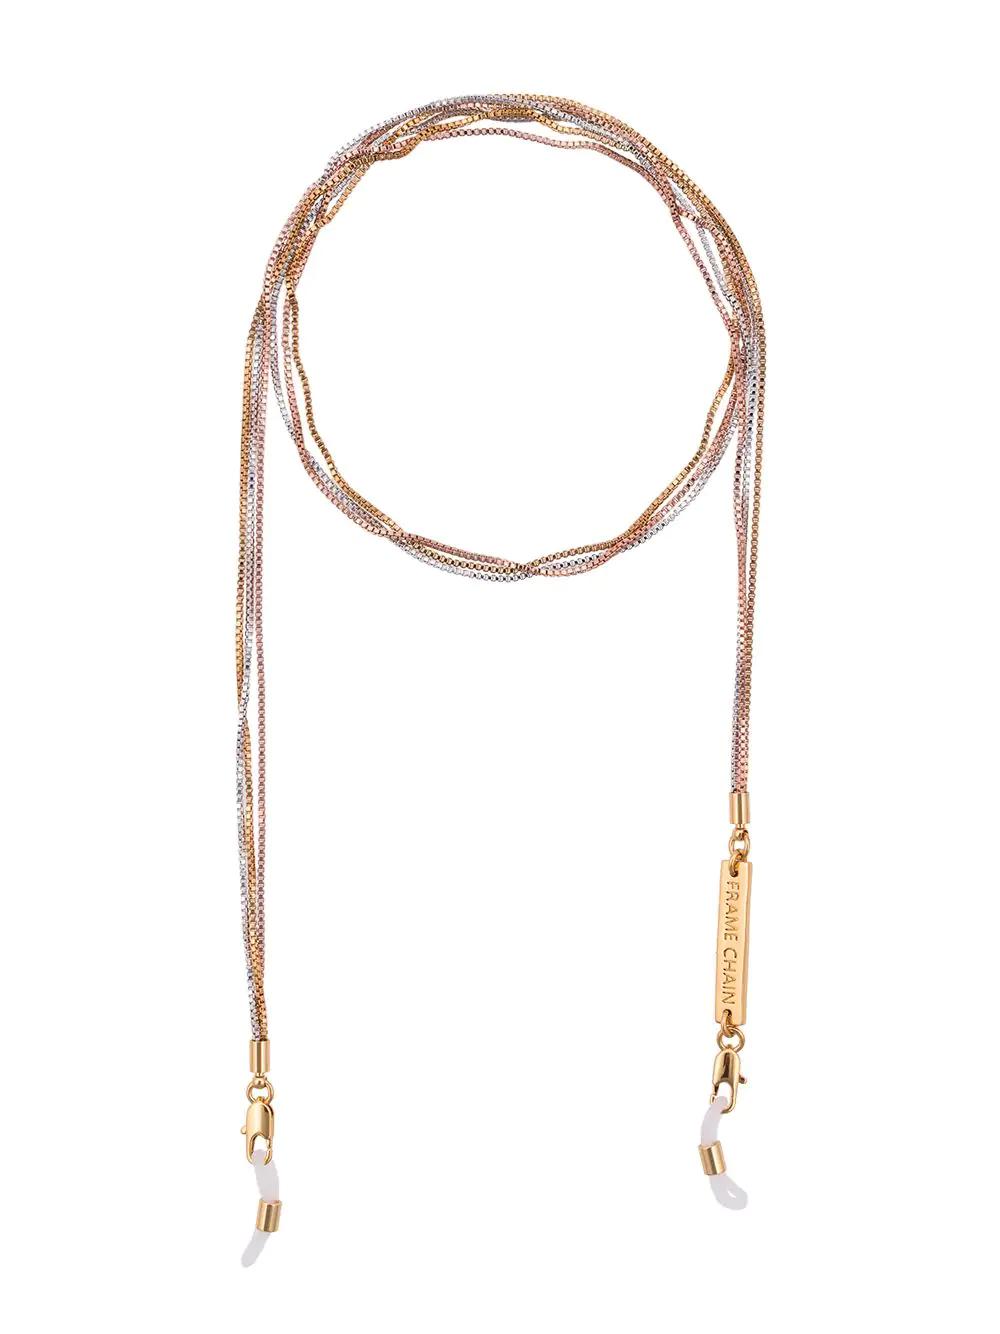 Frame Chain   трехцветный цепочный брелок для ключей   Clouty